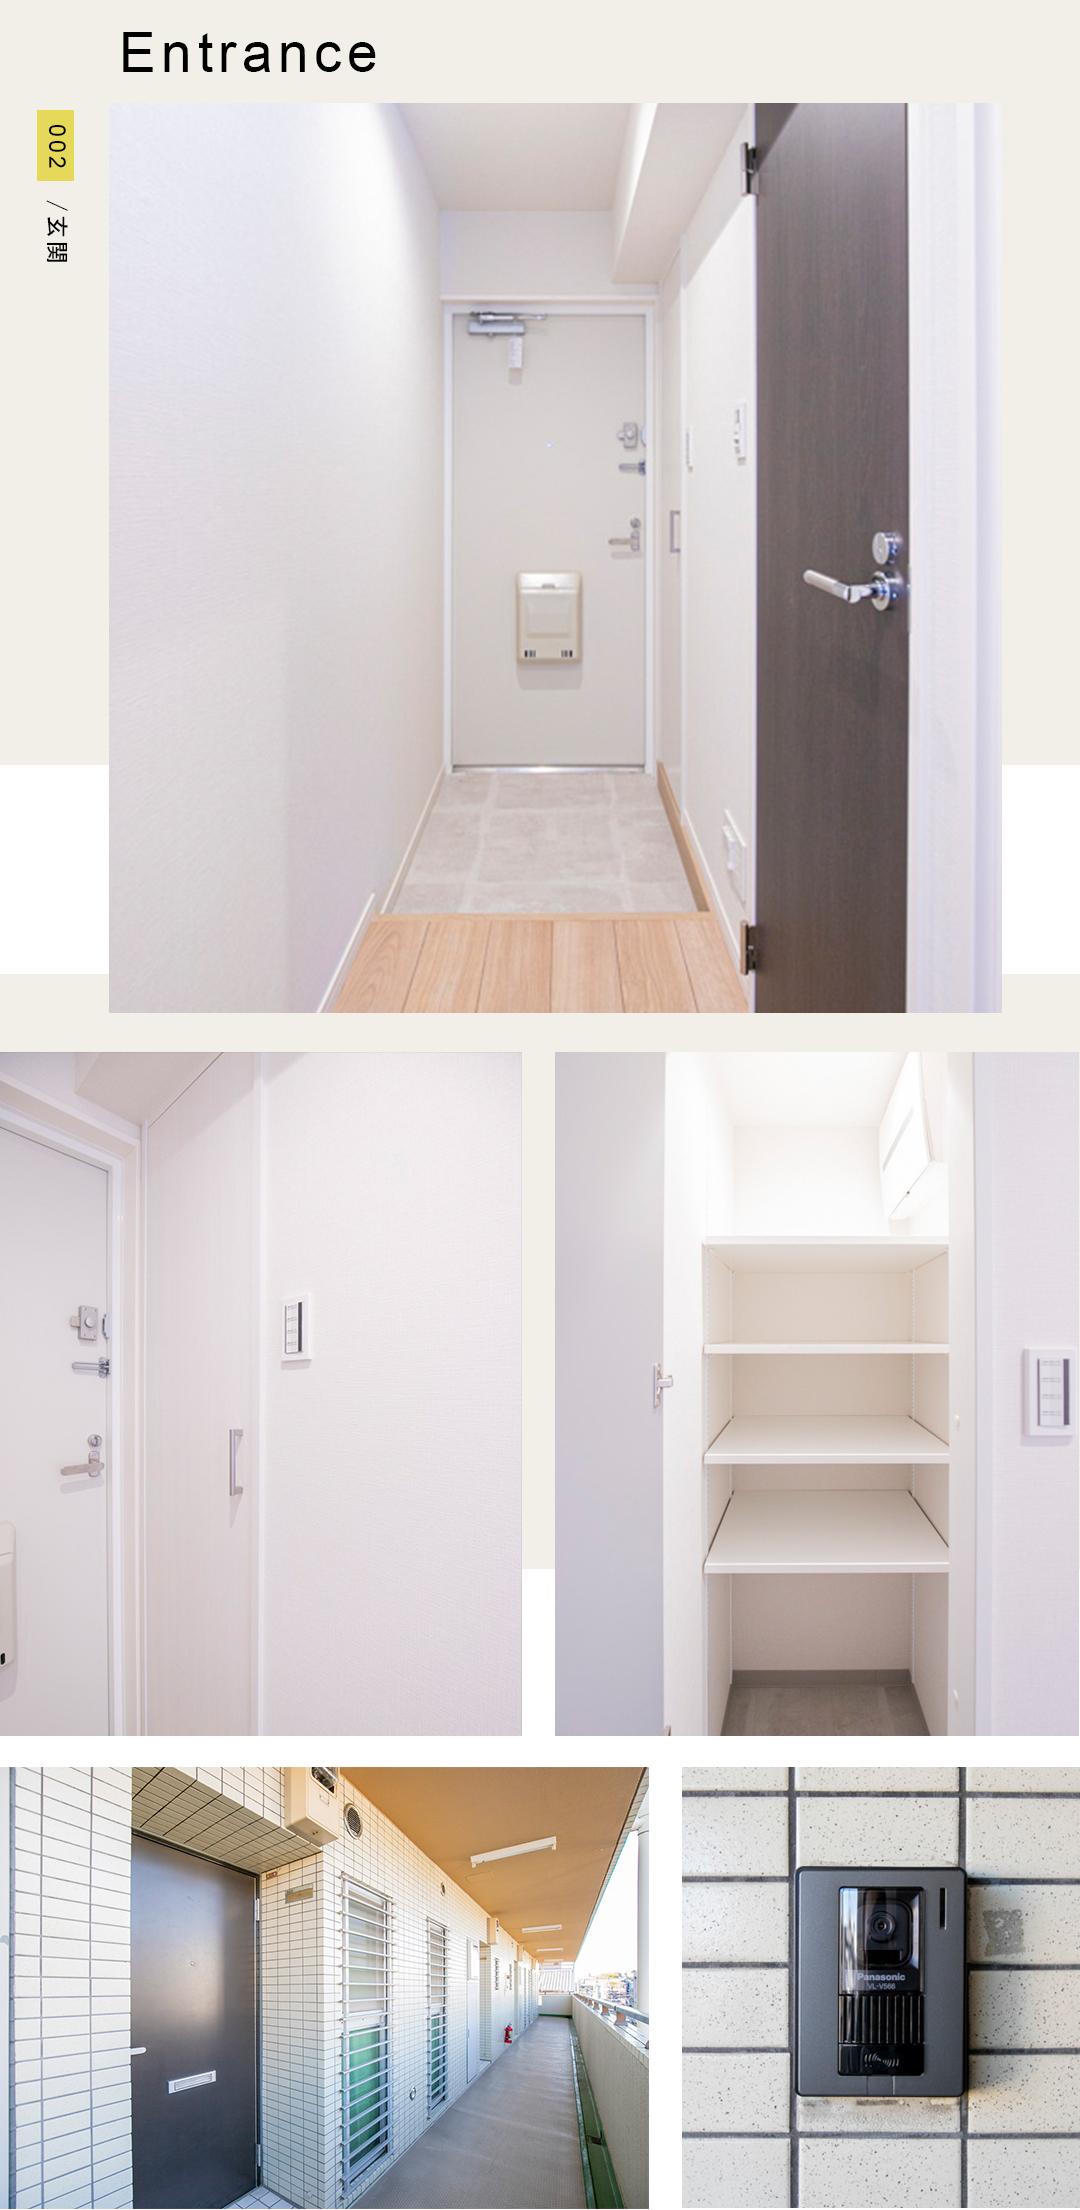 002,Entrance,玄関,,,,